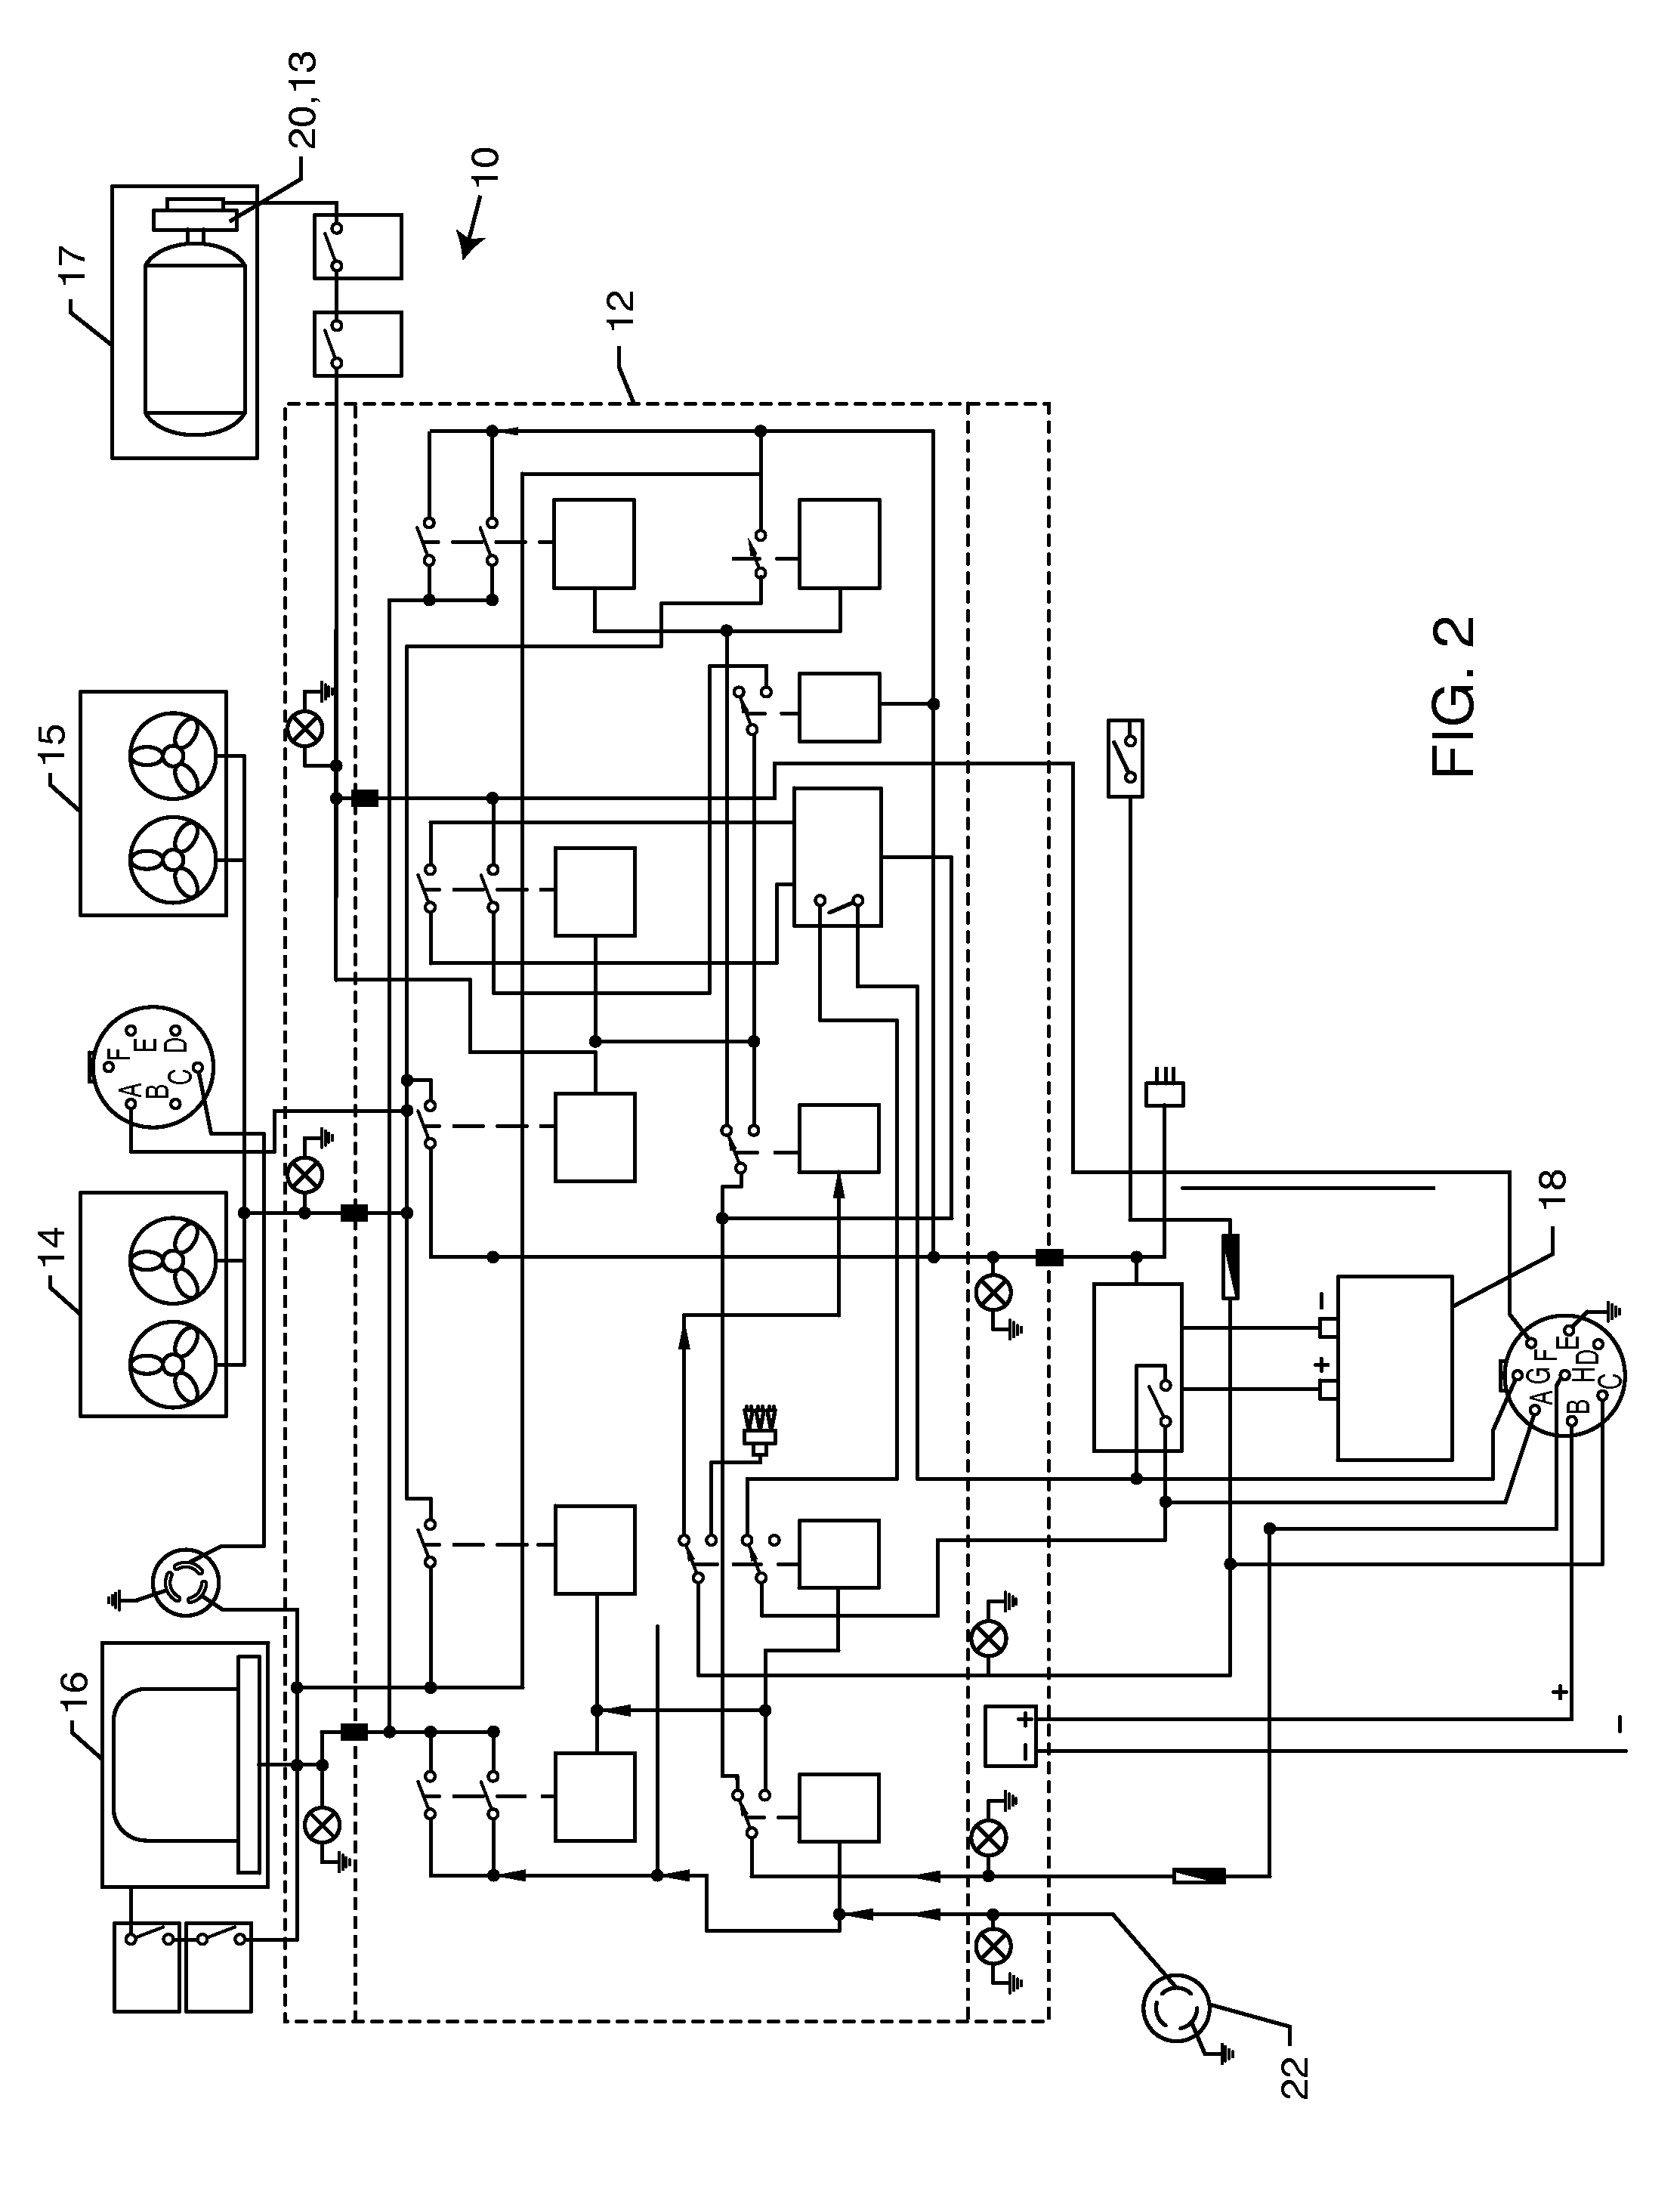 Ductless Mini Split Wiring Harness Great Installation Of Daikin Diagram Heat Pump Systems